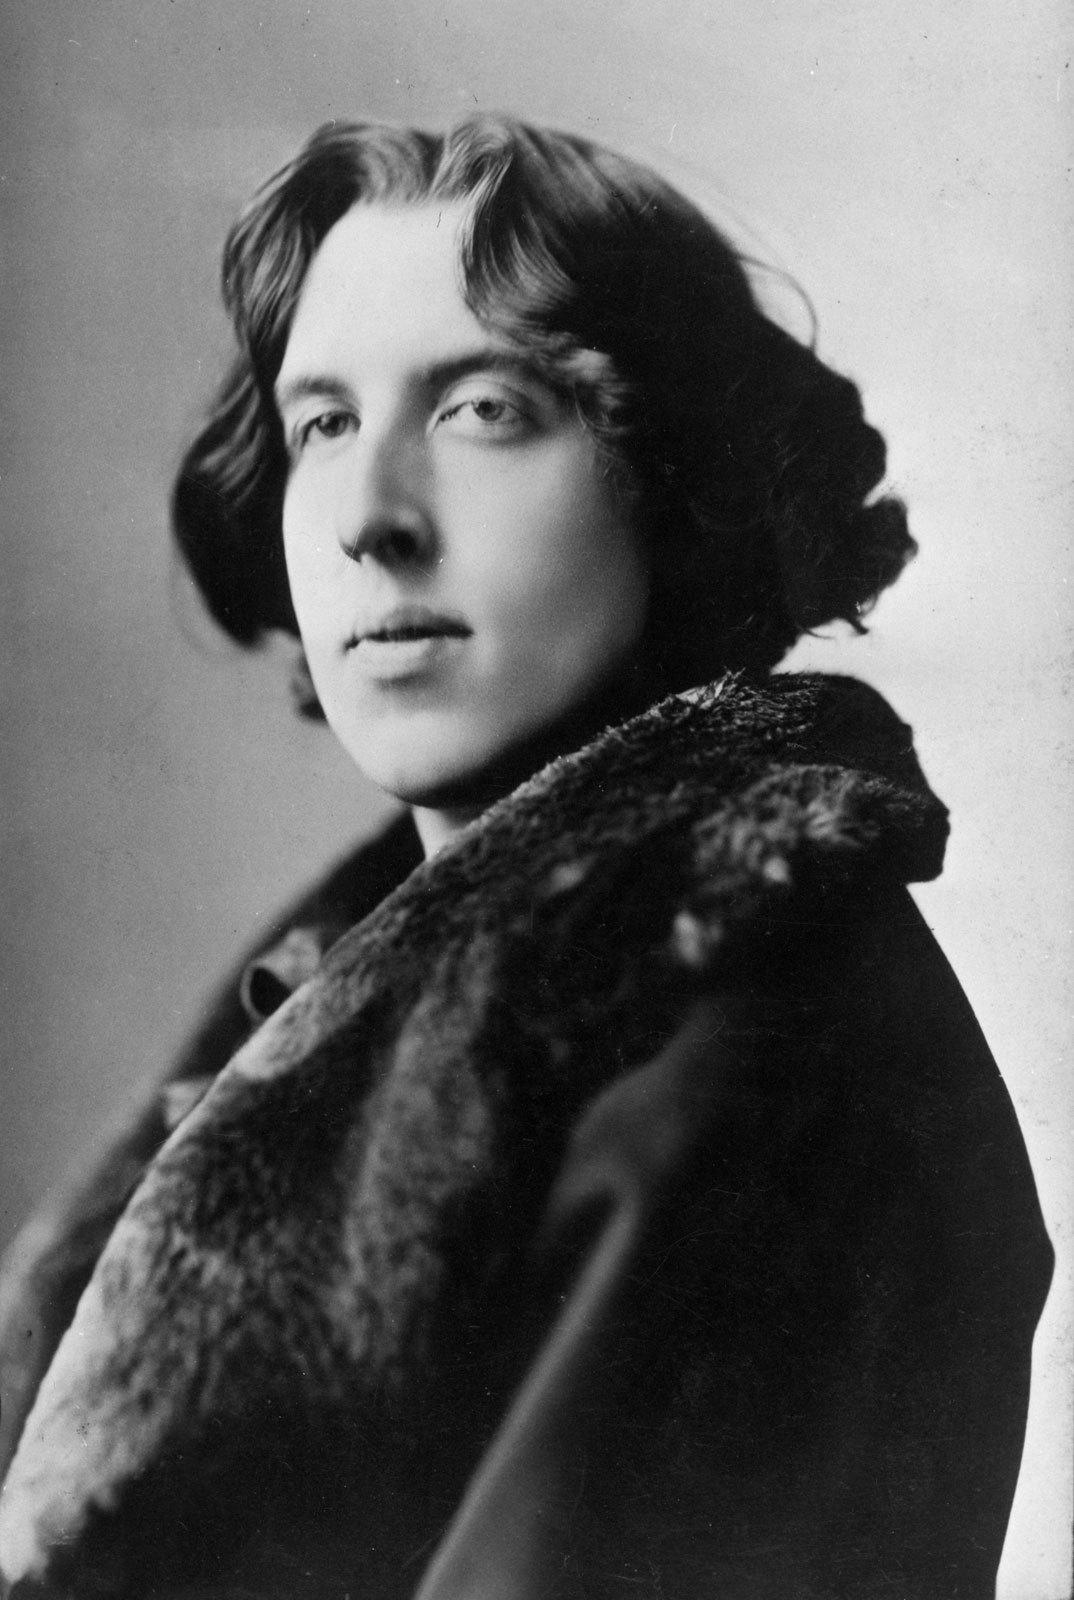 Oscar Wilde images